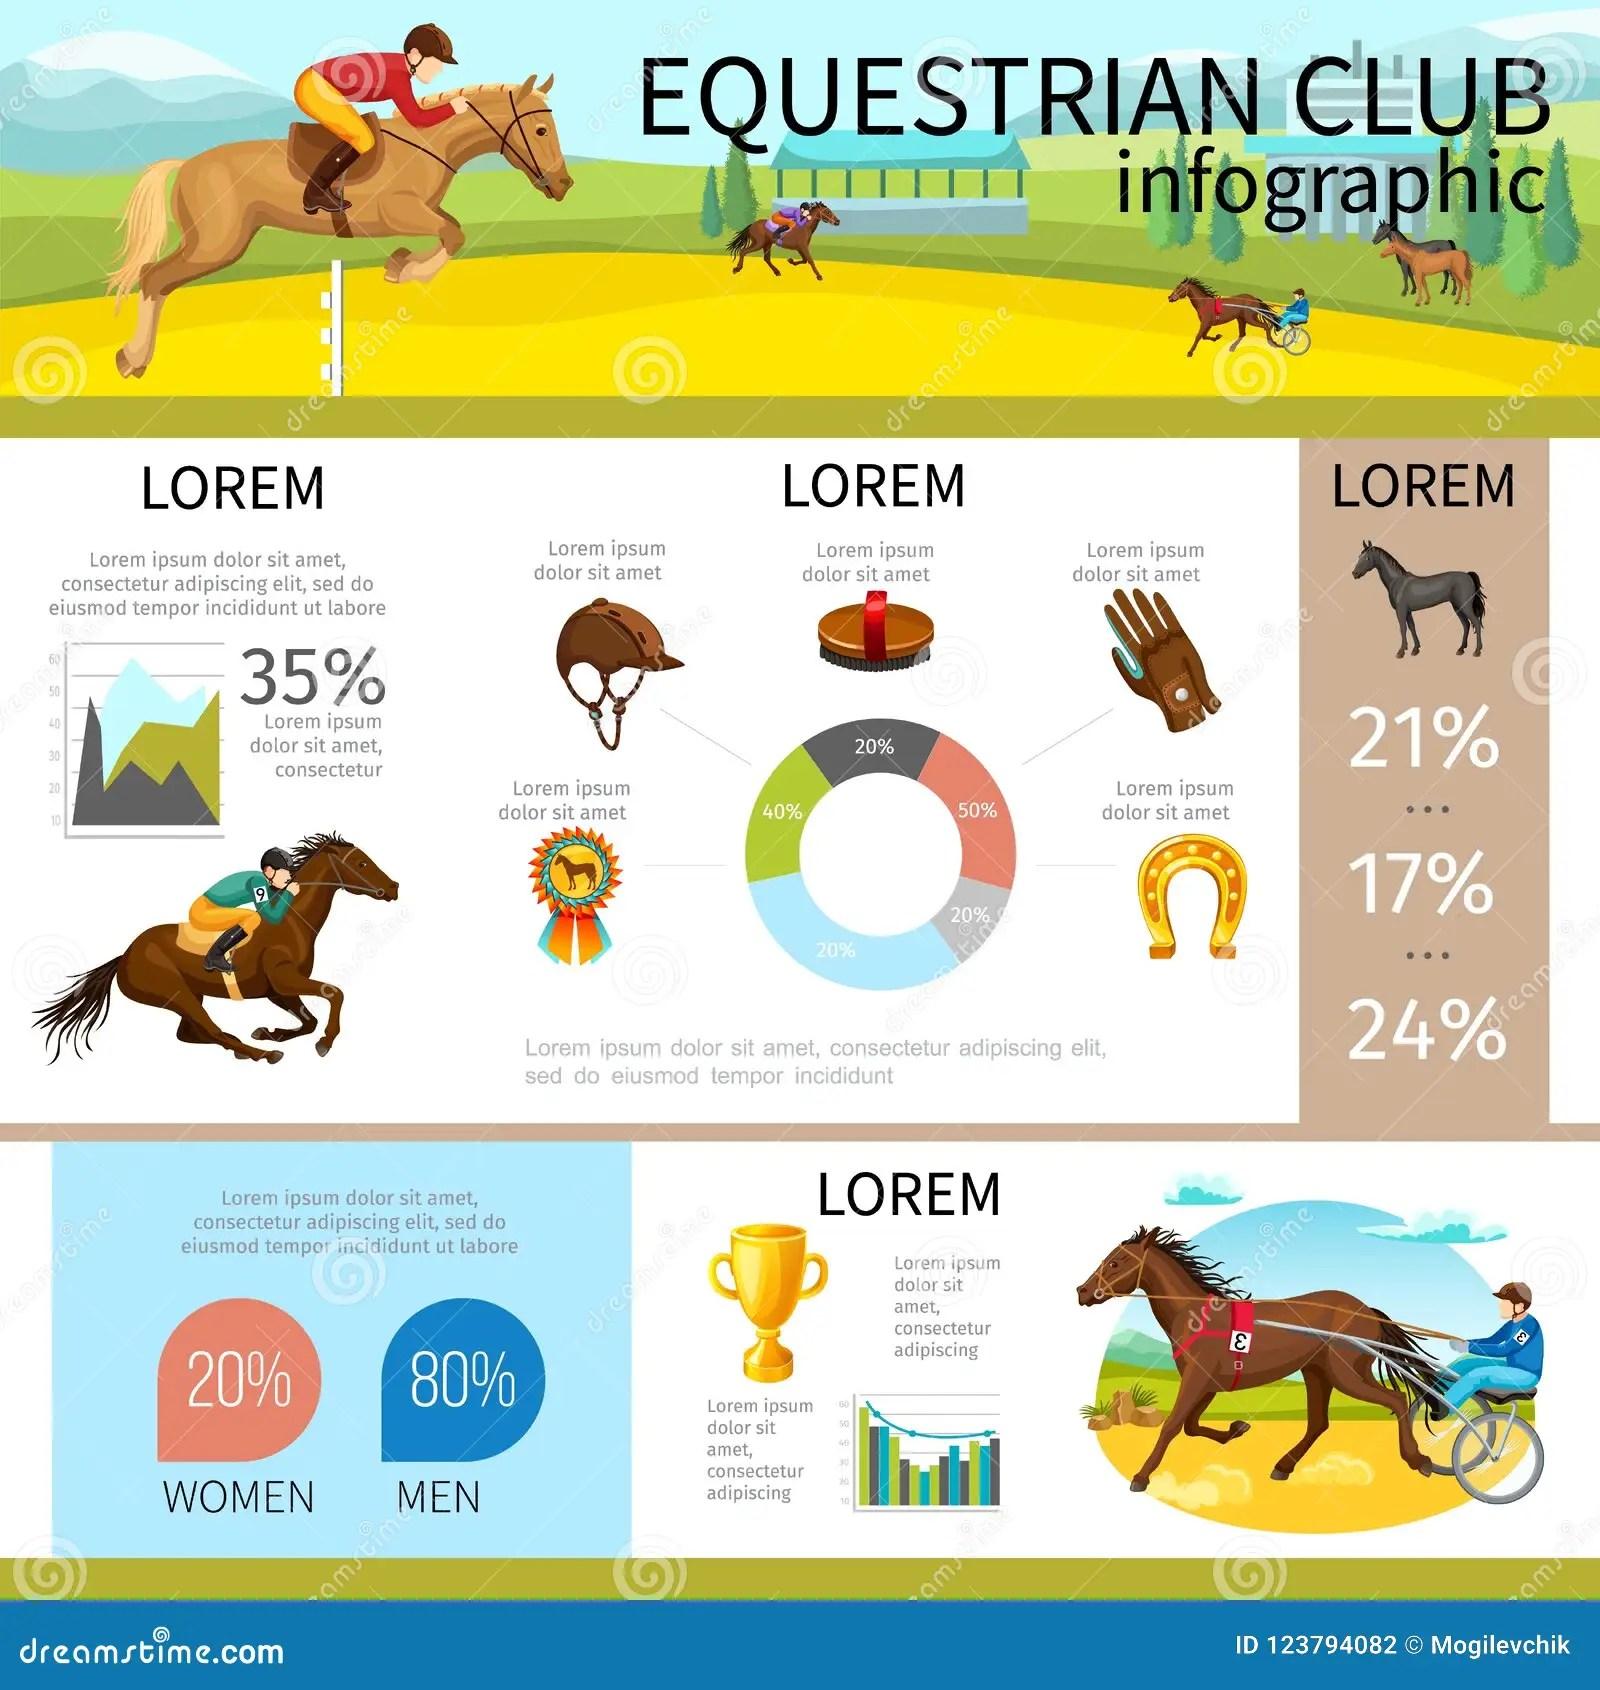 hight resolution of cartoon equestrian club infographic template with jockeys riding horses cap glove horseshoe medal brush diagram graphs vector illustration